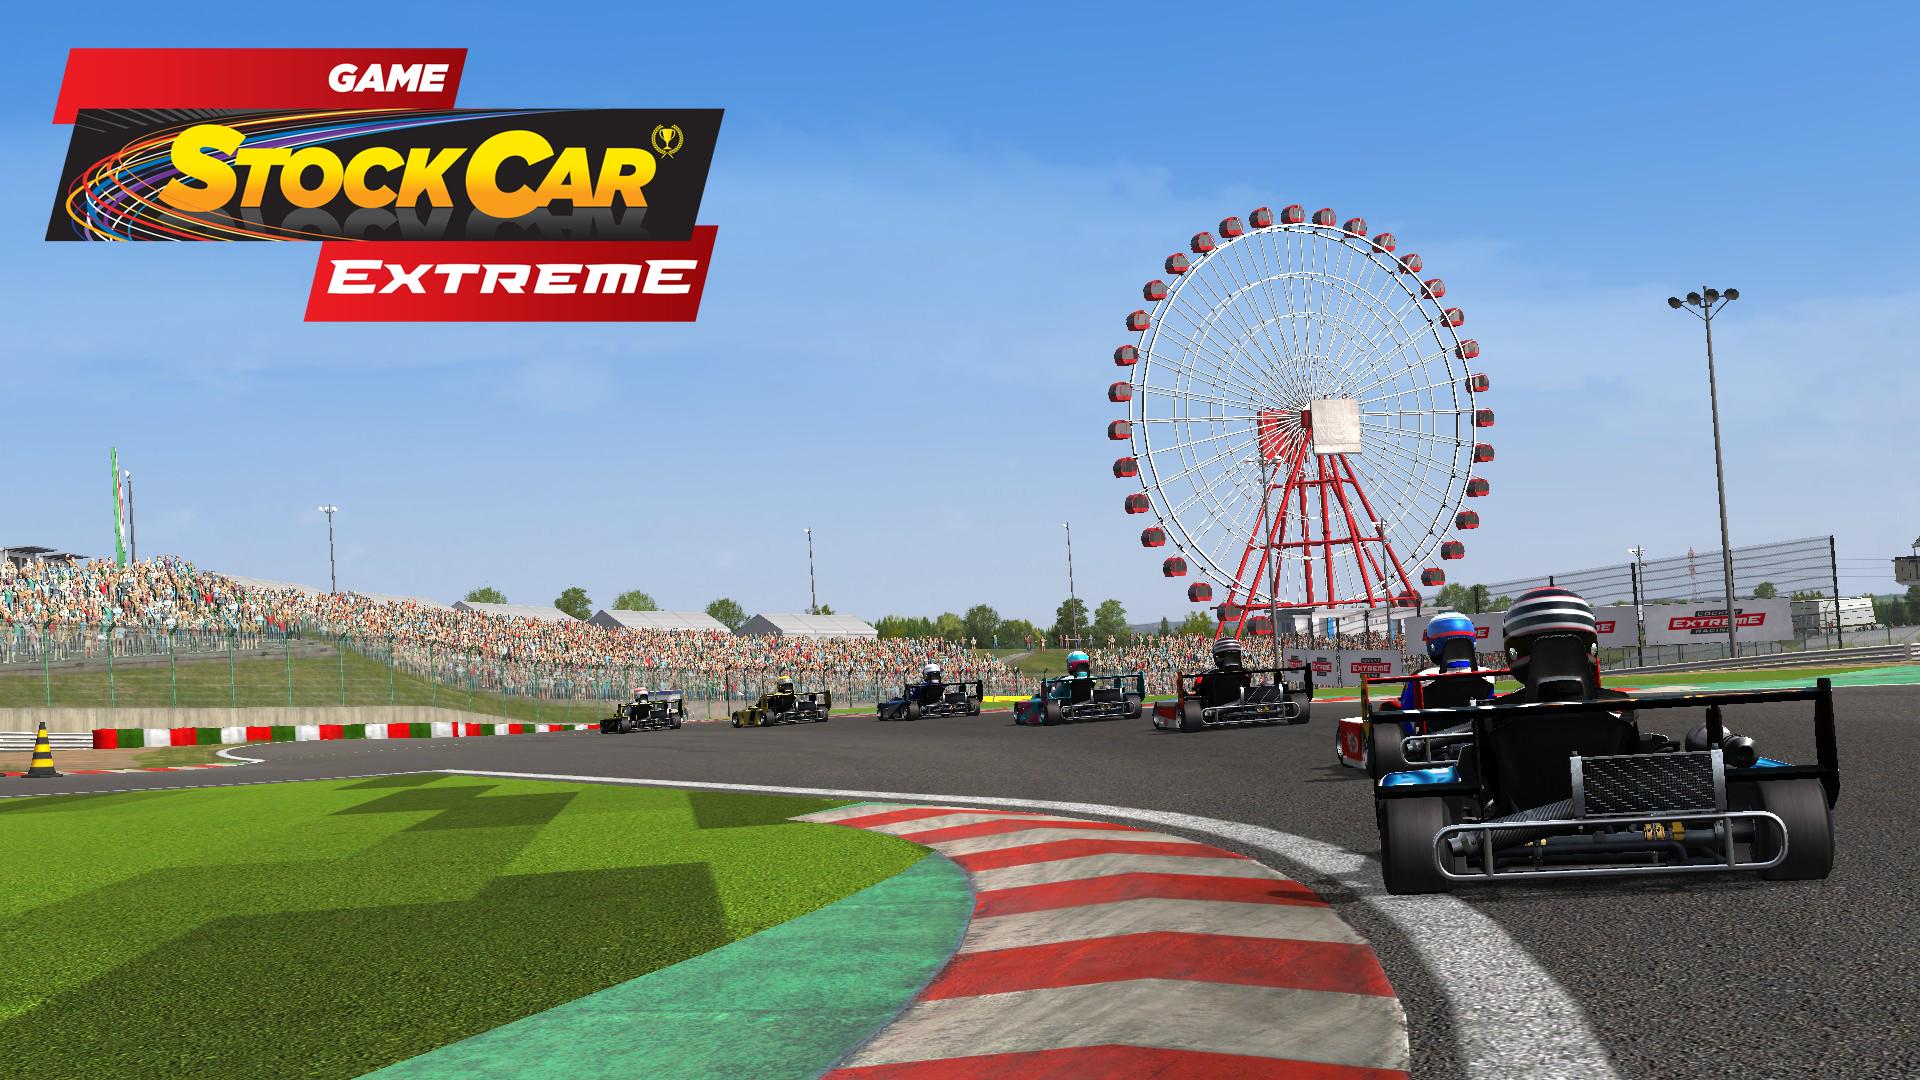 Stock Car Extreme - Superkarts and Suzuka